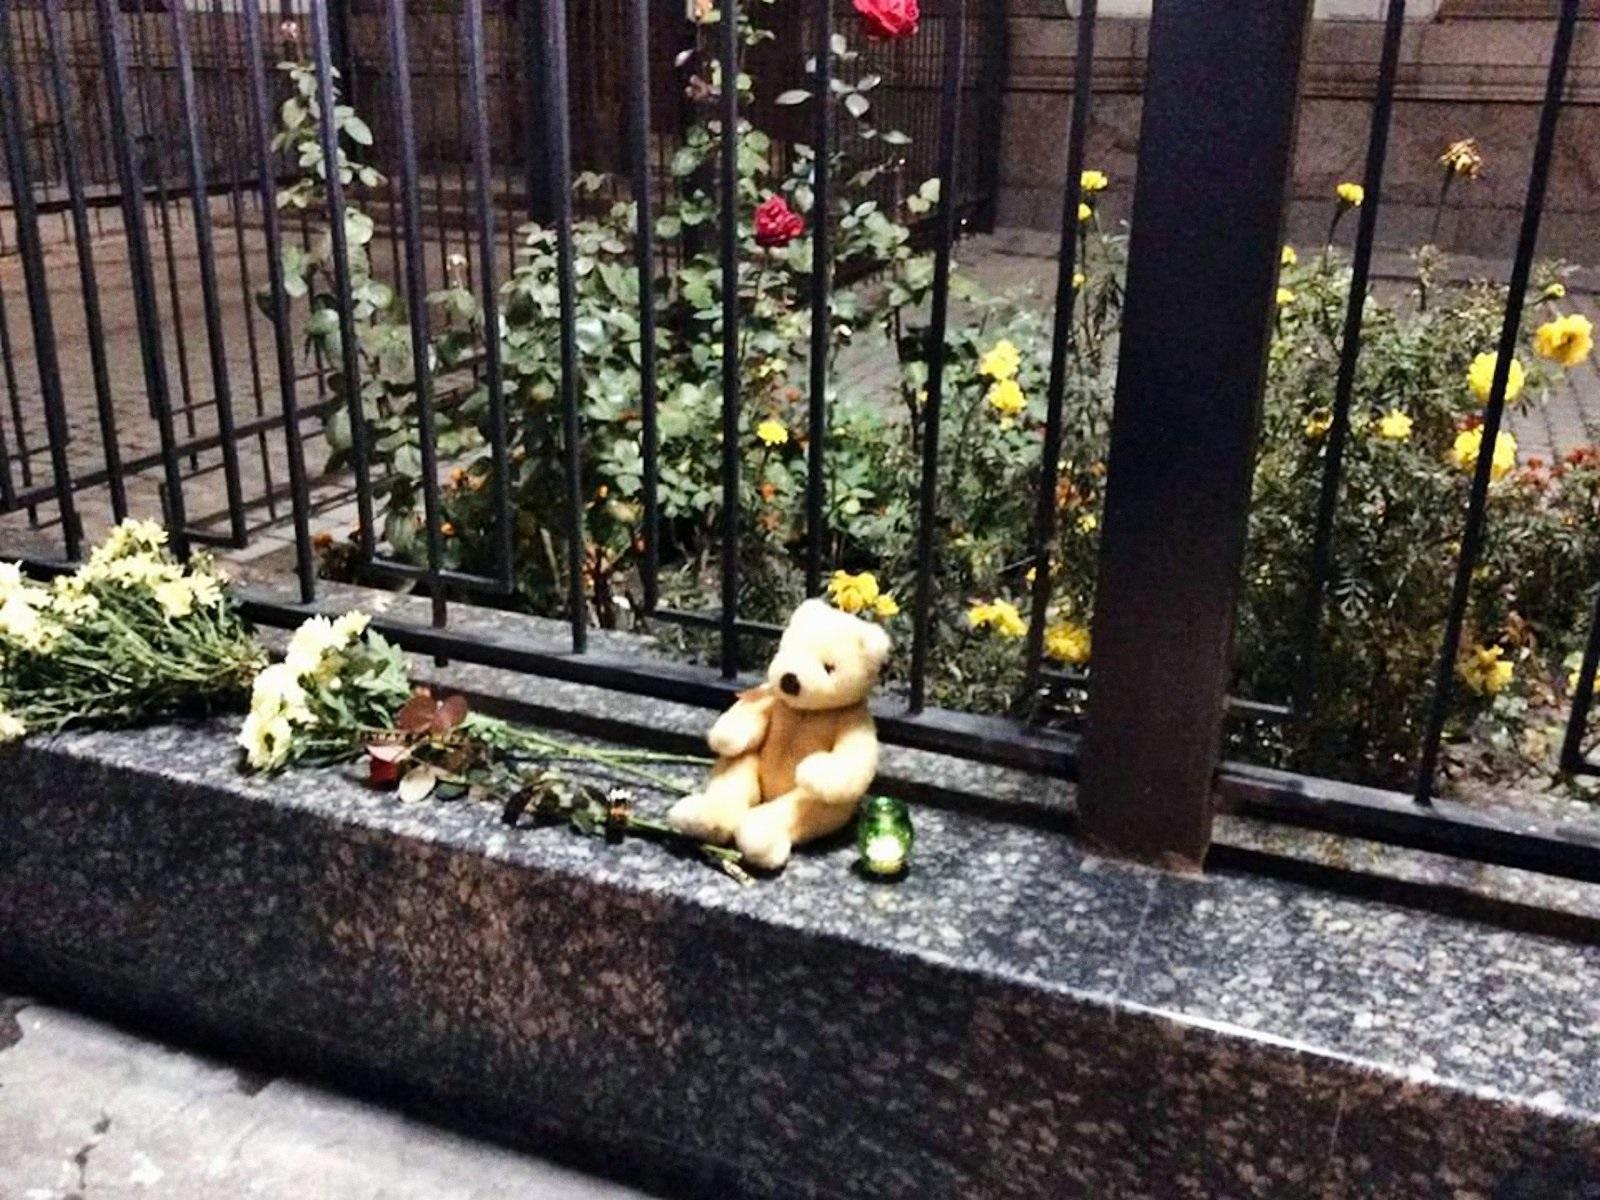 00 kiev embassy russia airliner crash 03 311015